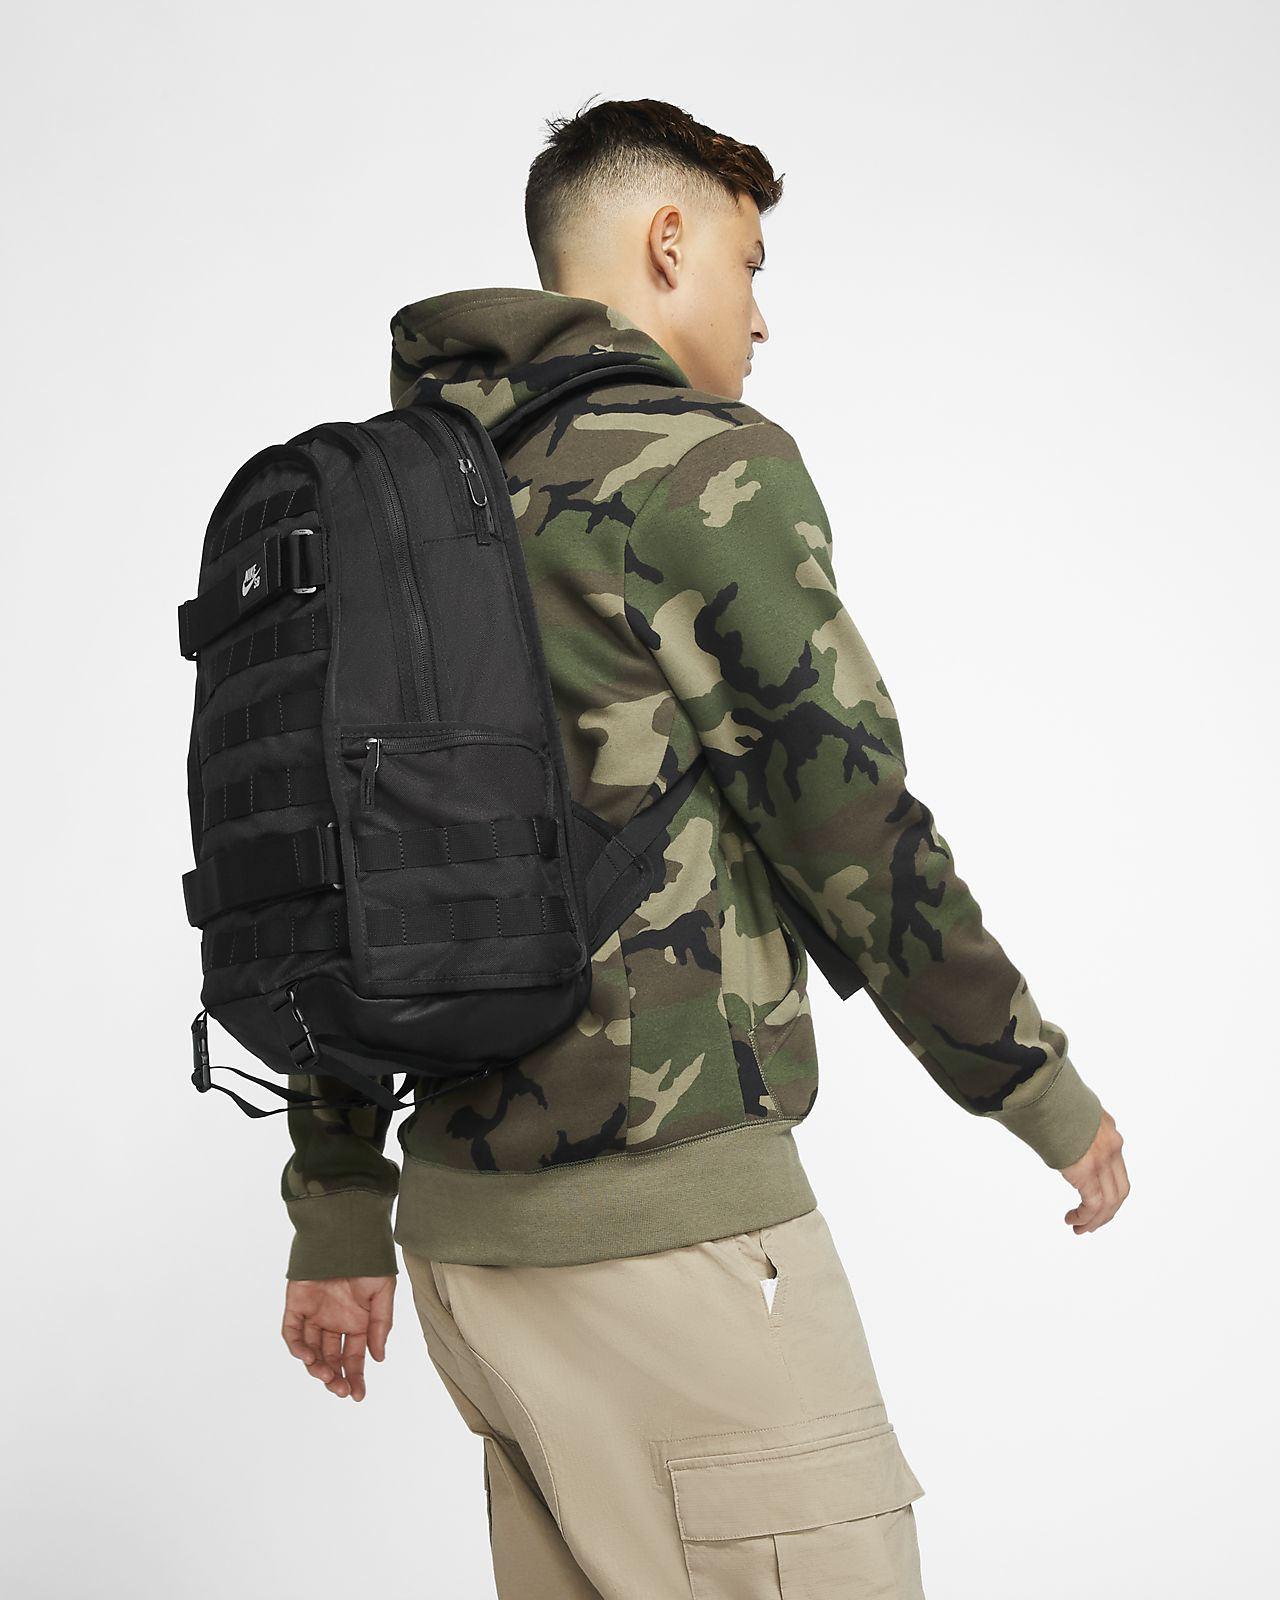 traidor gráfico Latón  nike sb military backpack Shop Clothing & Shoes Online